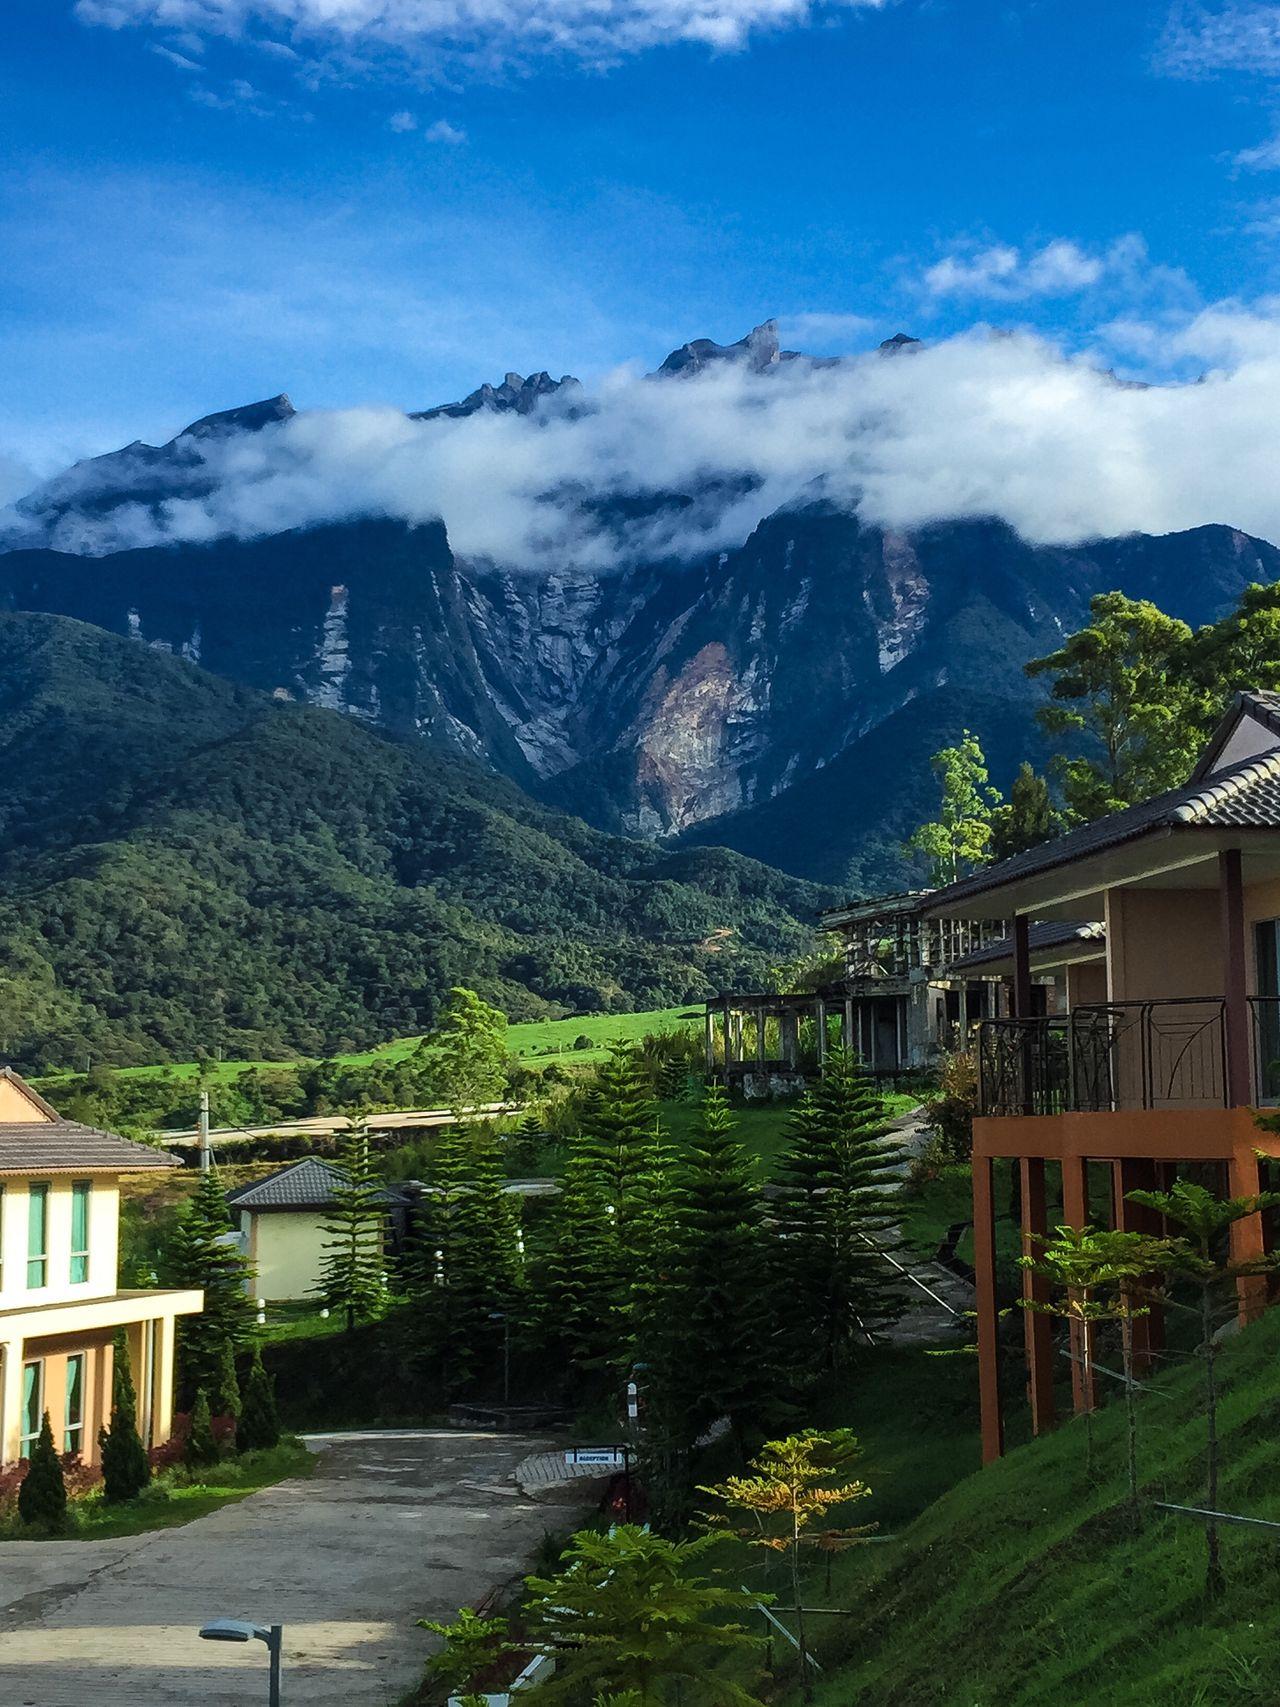 kampung di kaki gunung Kinabalu Footmountain Mountain View Mountain_collection Mount Kinabalu Sabah Borneo Scenic Amazing View Mothernature SimplyAmazing Best Destination UNESCO World Heritage Site The Photojournalist - 2016 EyeEm Awards The Great Outdoors - 2016 EyeEm Awards